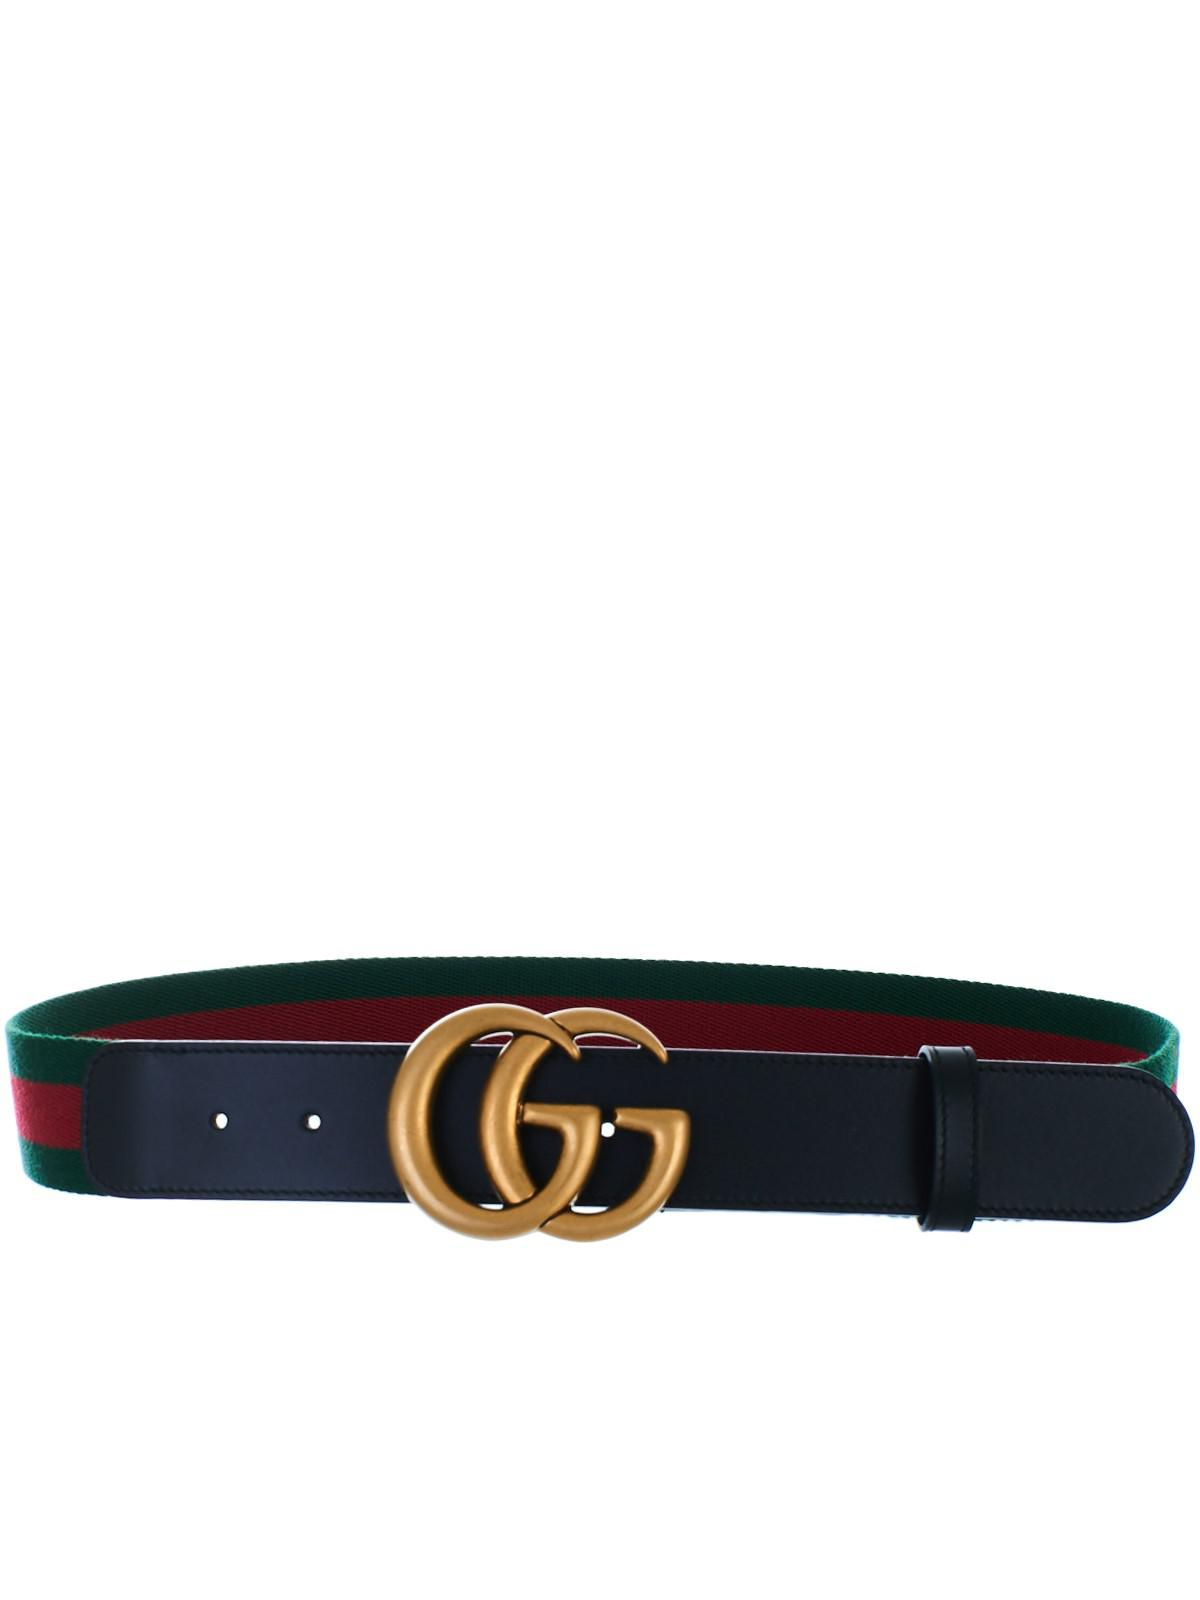 bfaa89edb163 Lyst - Gucci Black GG Marmont Belt in Black - Save 3%